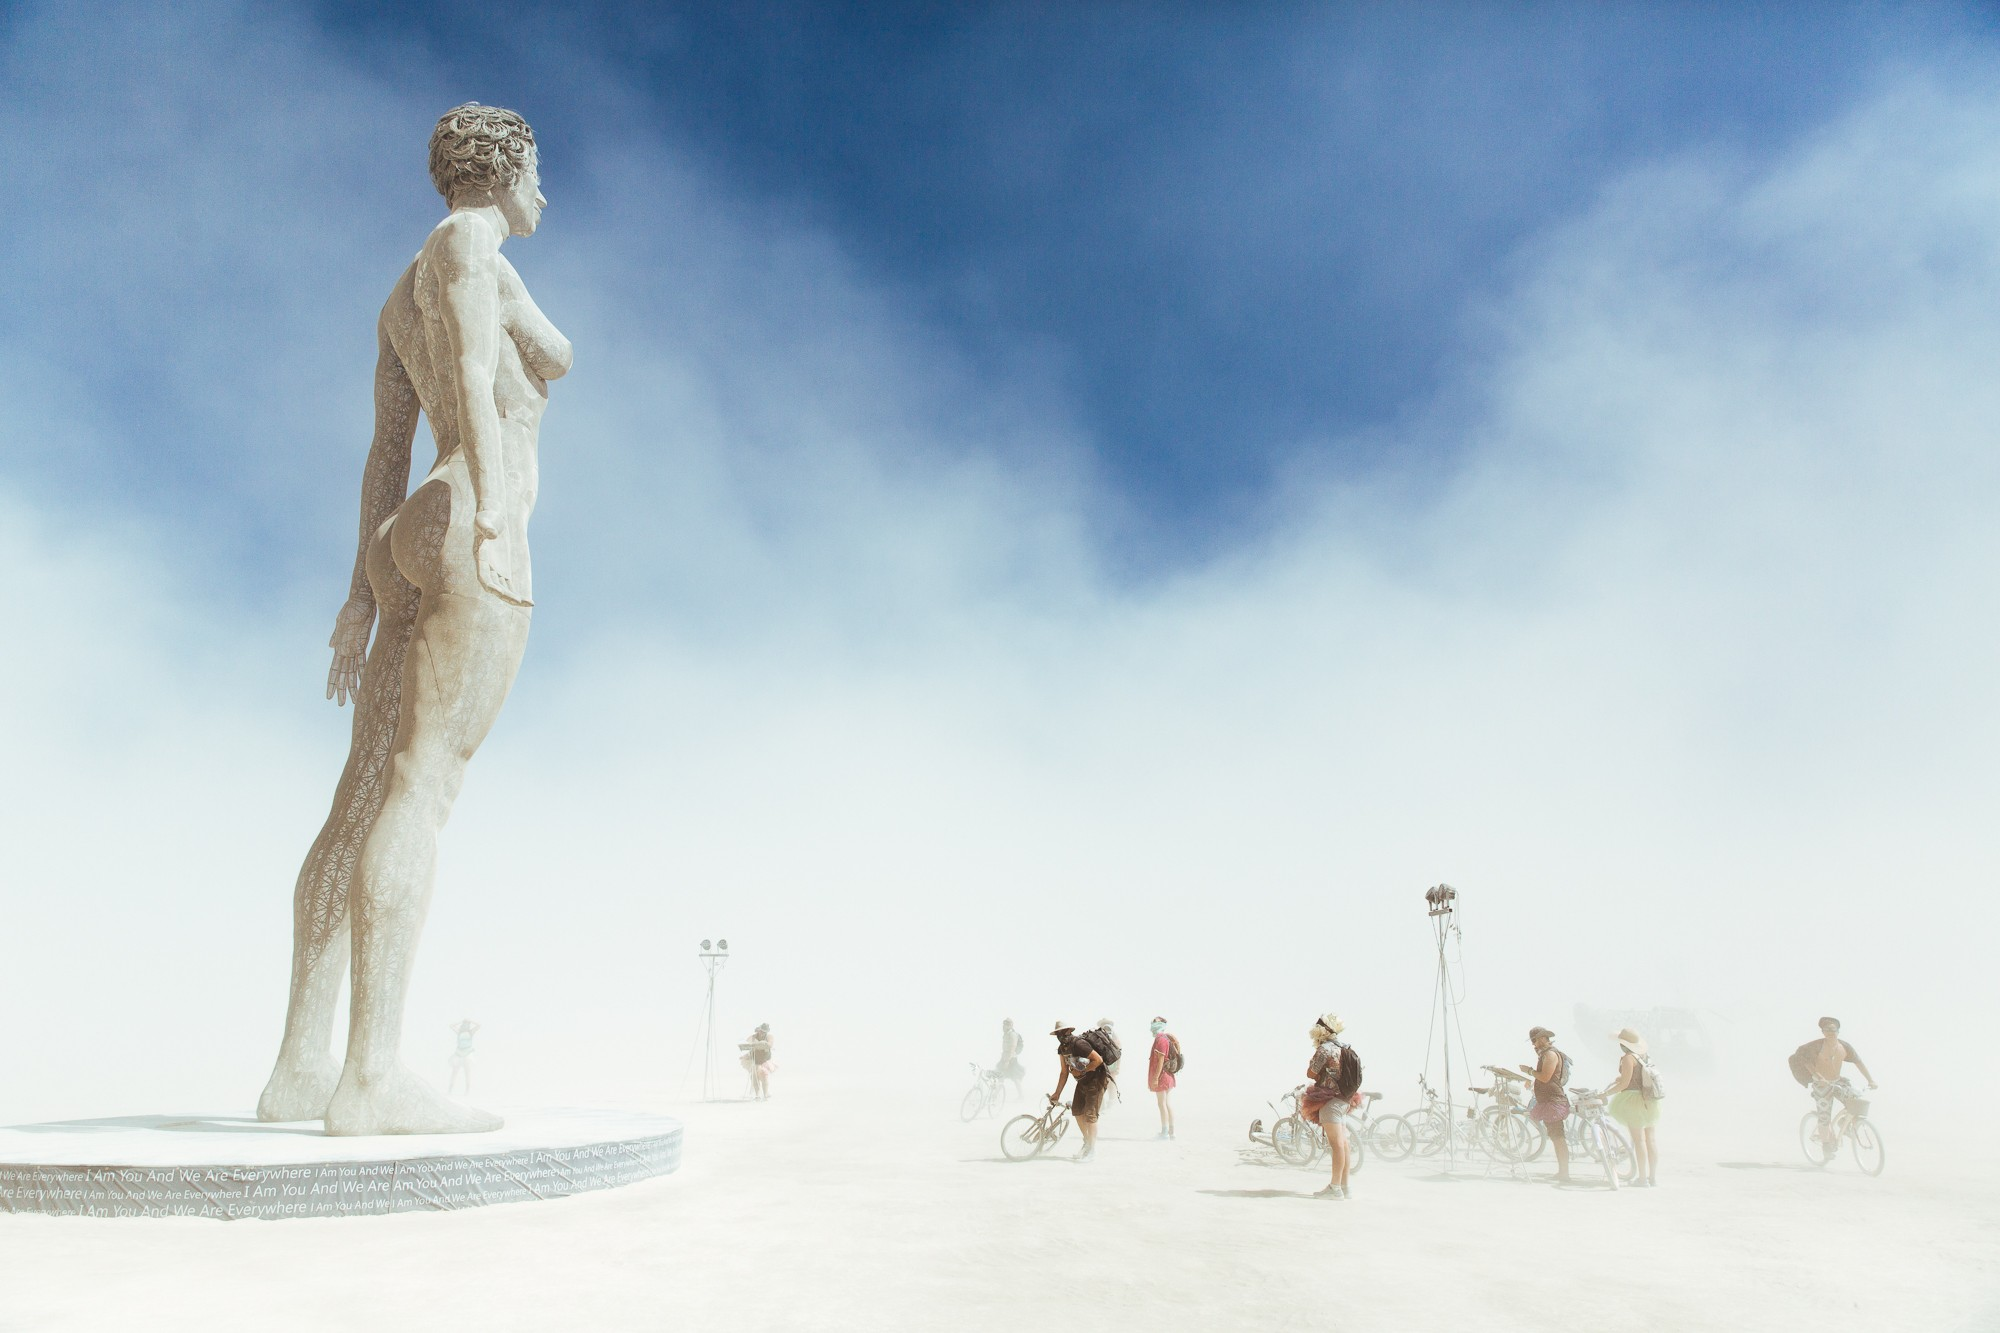 Matthieu-VAUTRIN-Burning-Man-08-2000x1333.jpg